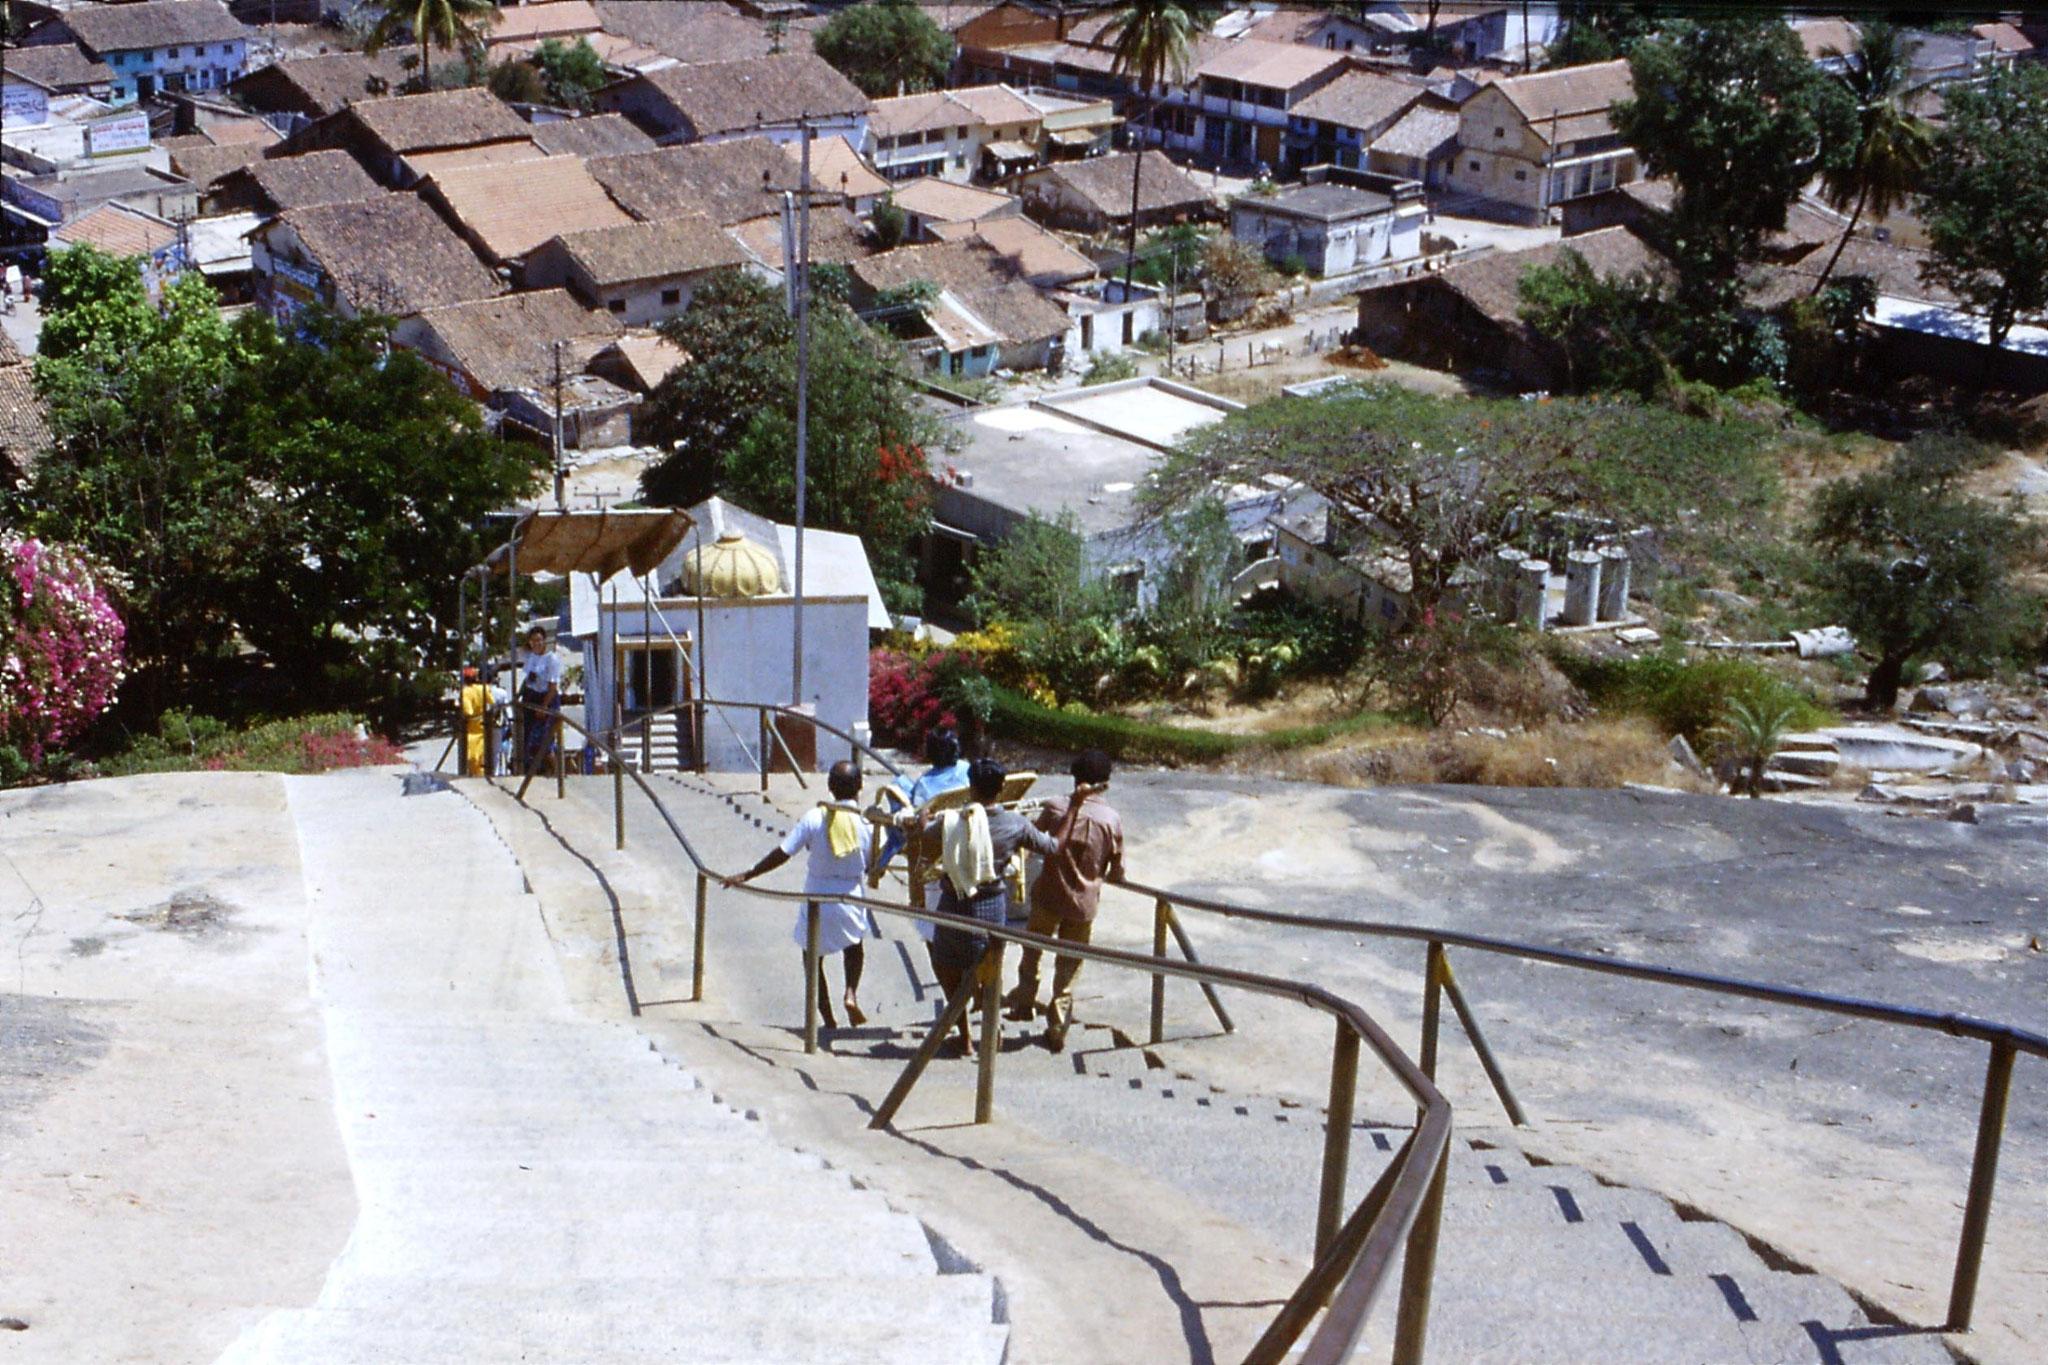 108/13: 13/3/1990 Sravanabelagola - woman carried on dholi, E behind